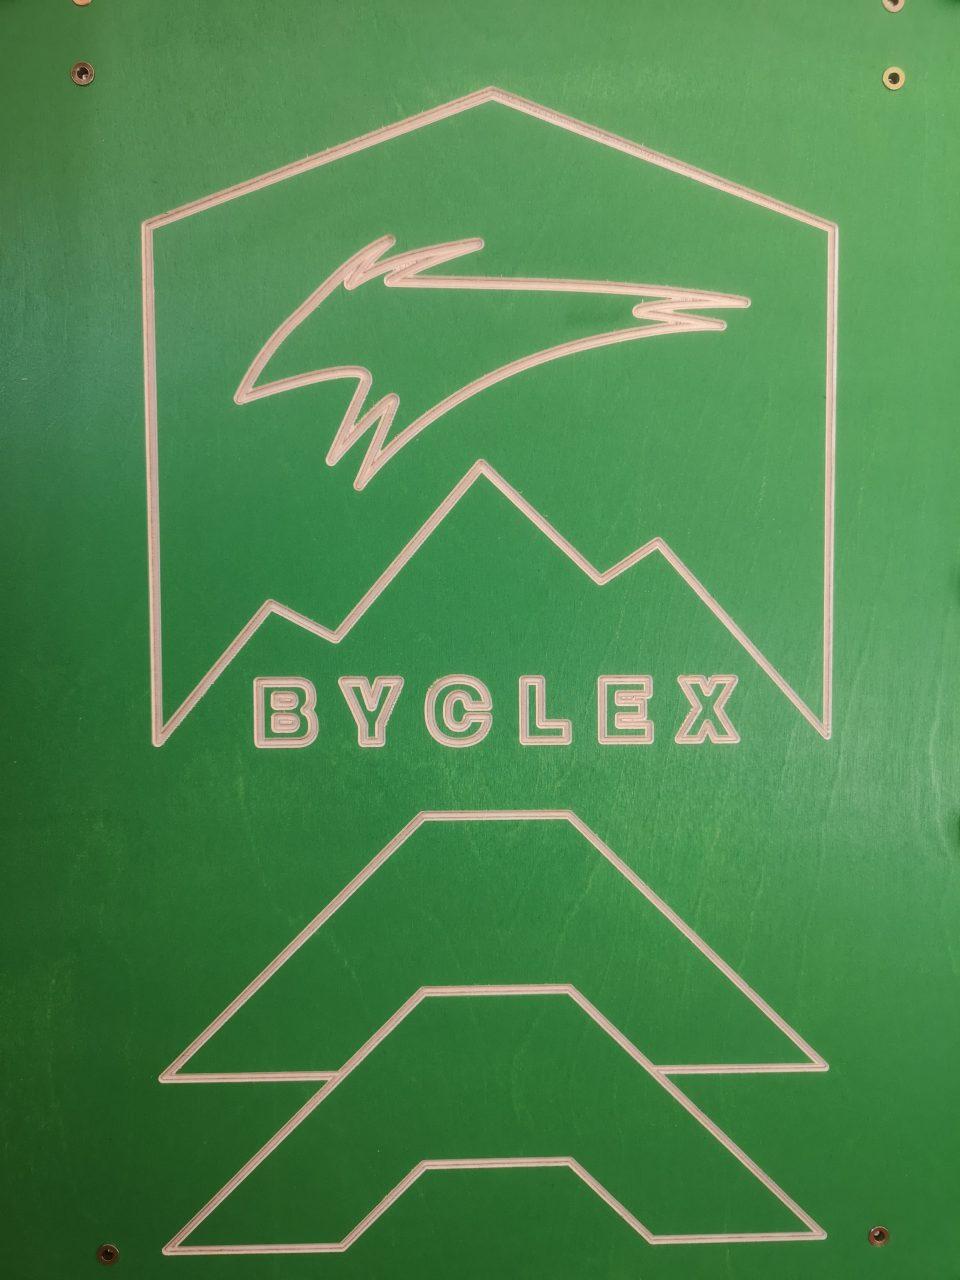 byclex rampe mtb bmx